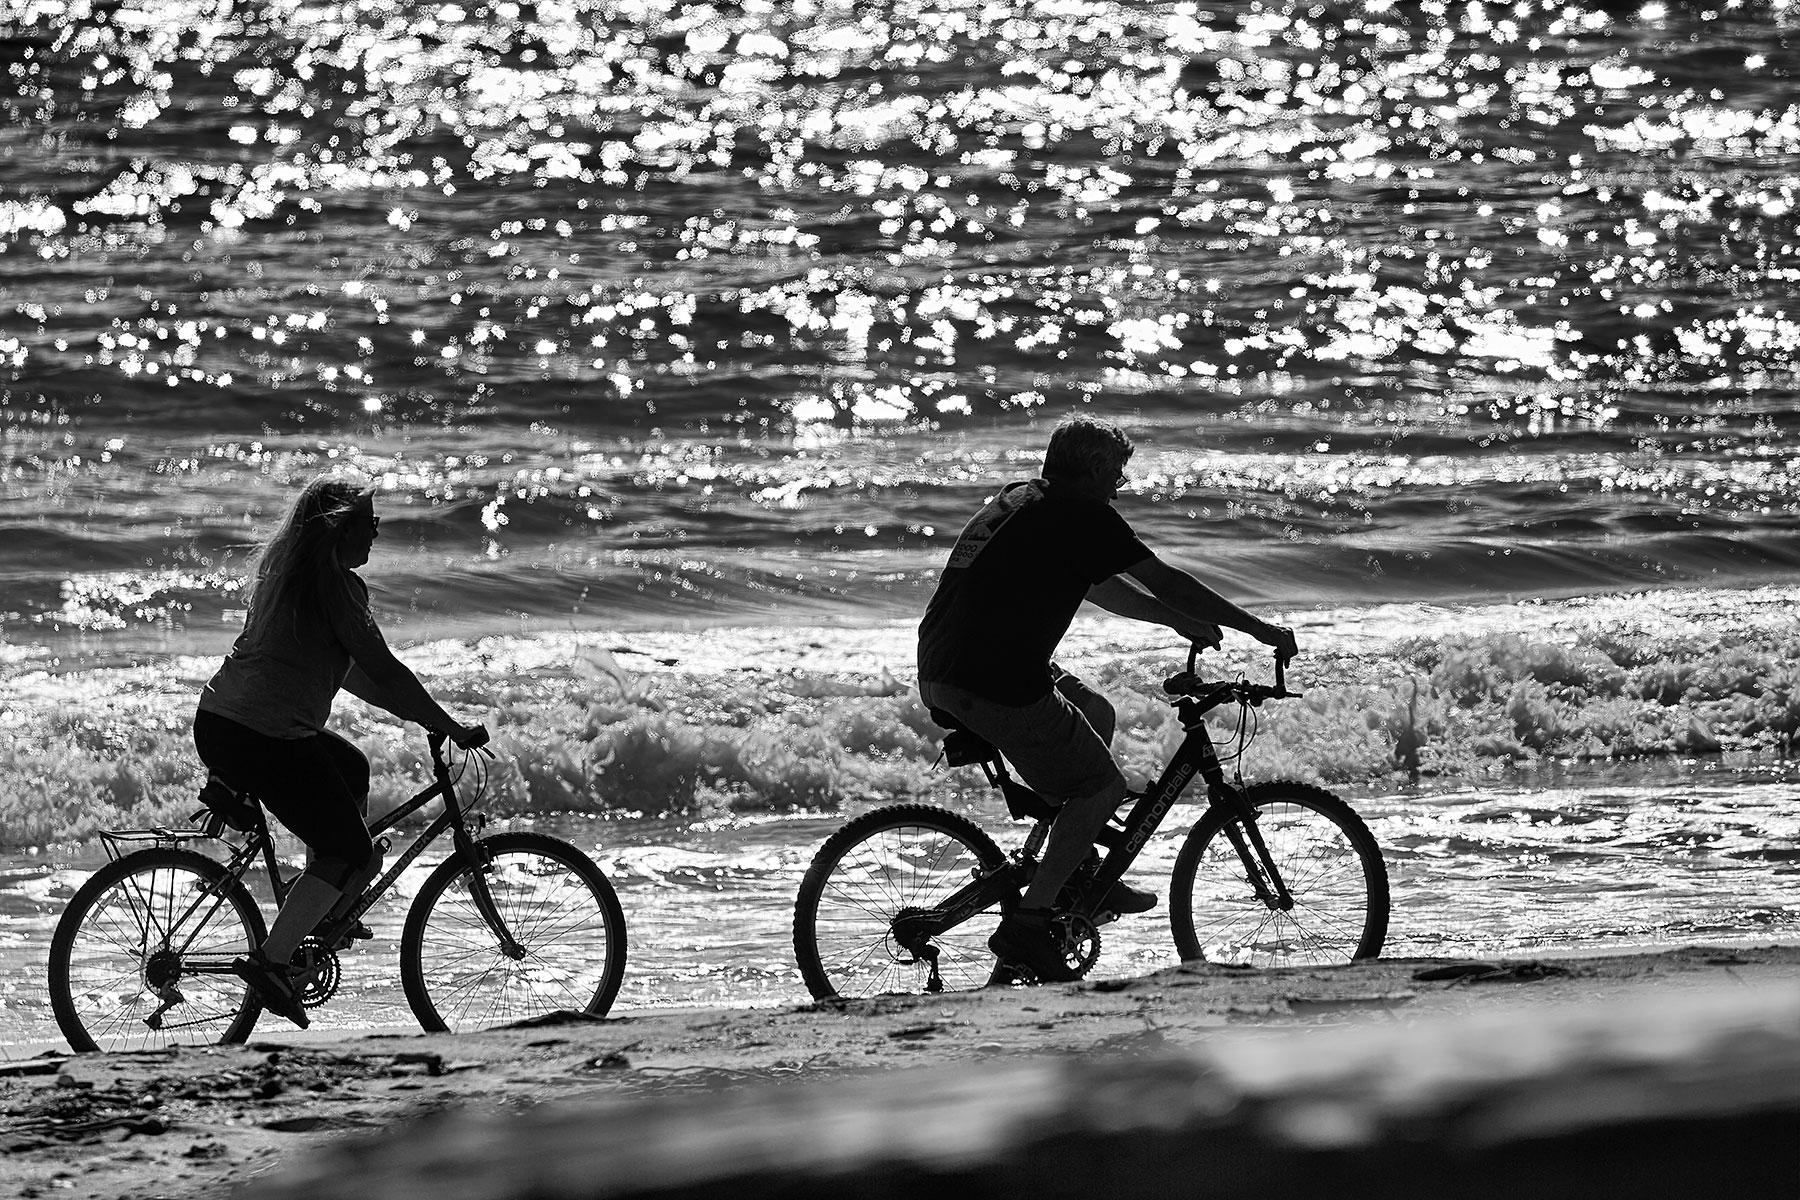 Beach Ride ©johncameron.ca